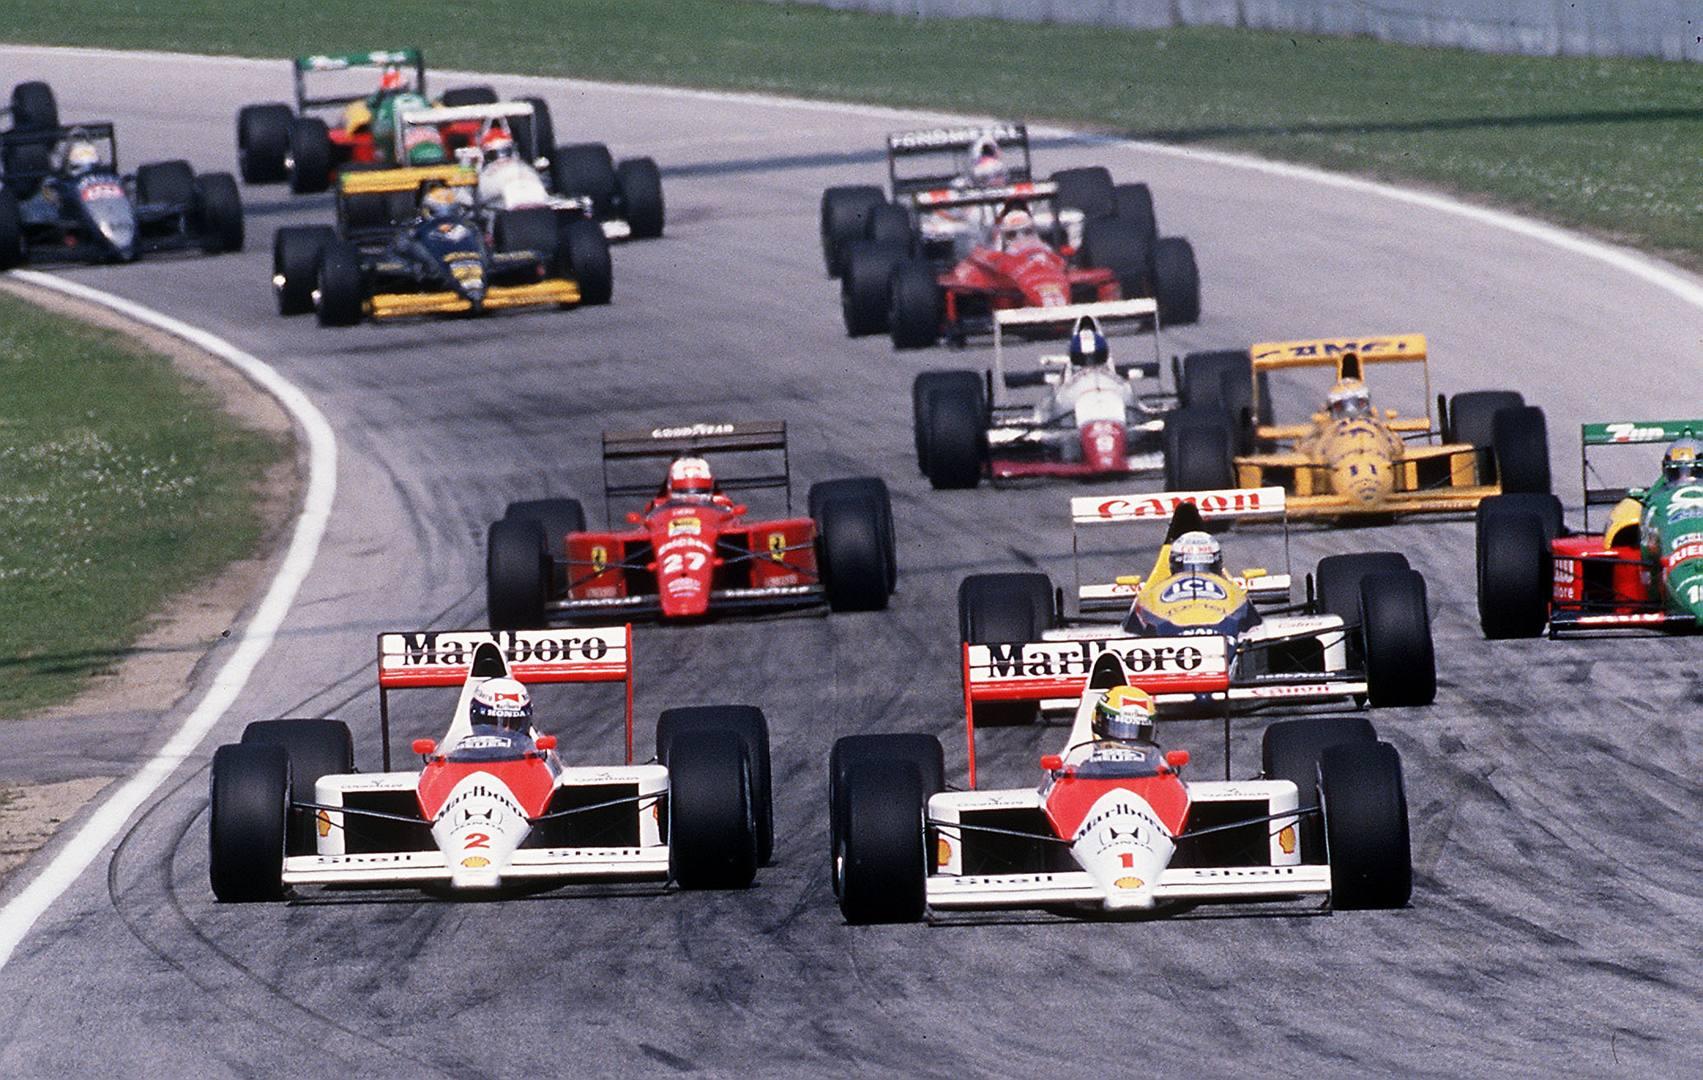 The legendary Imola race circuit